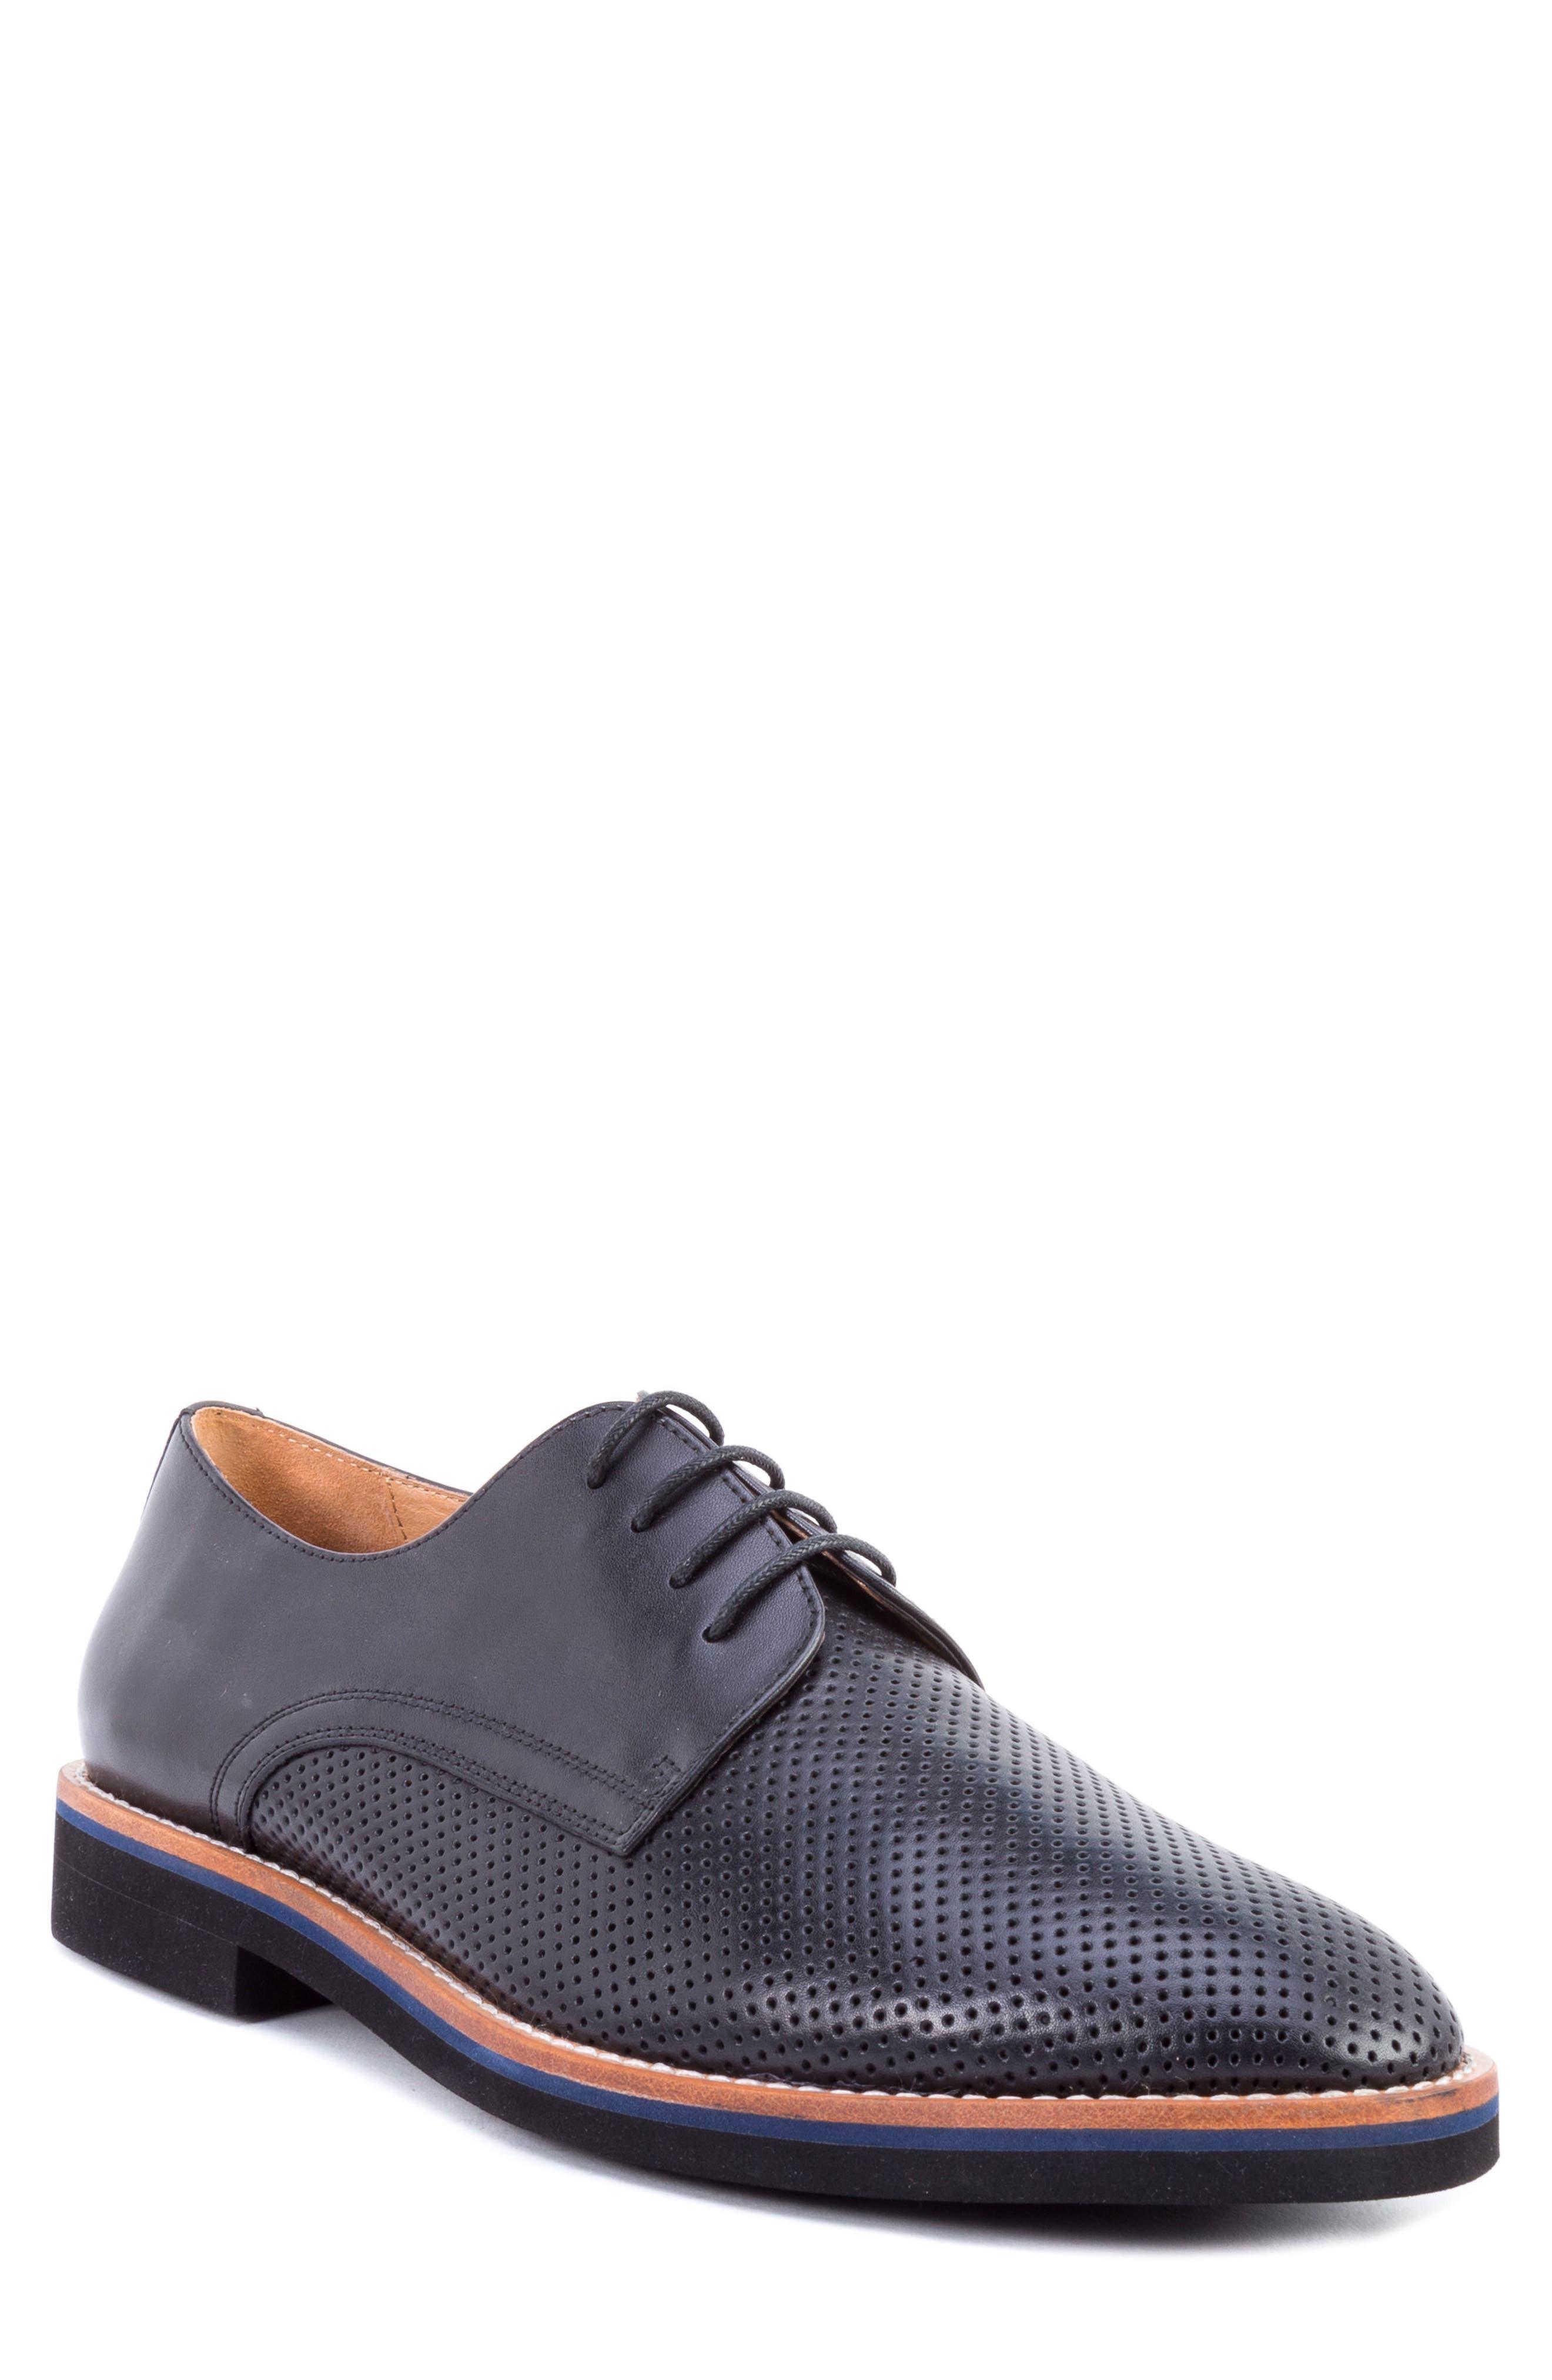 Alternate Image 1 Selected - Zanzara Hartung Perforated Plain Toe Derby (Men)